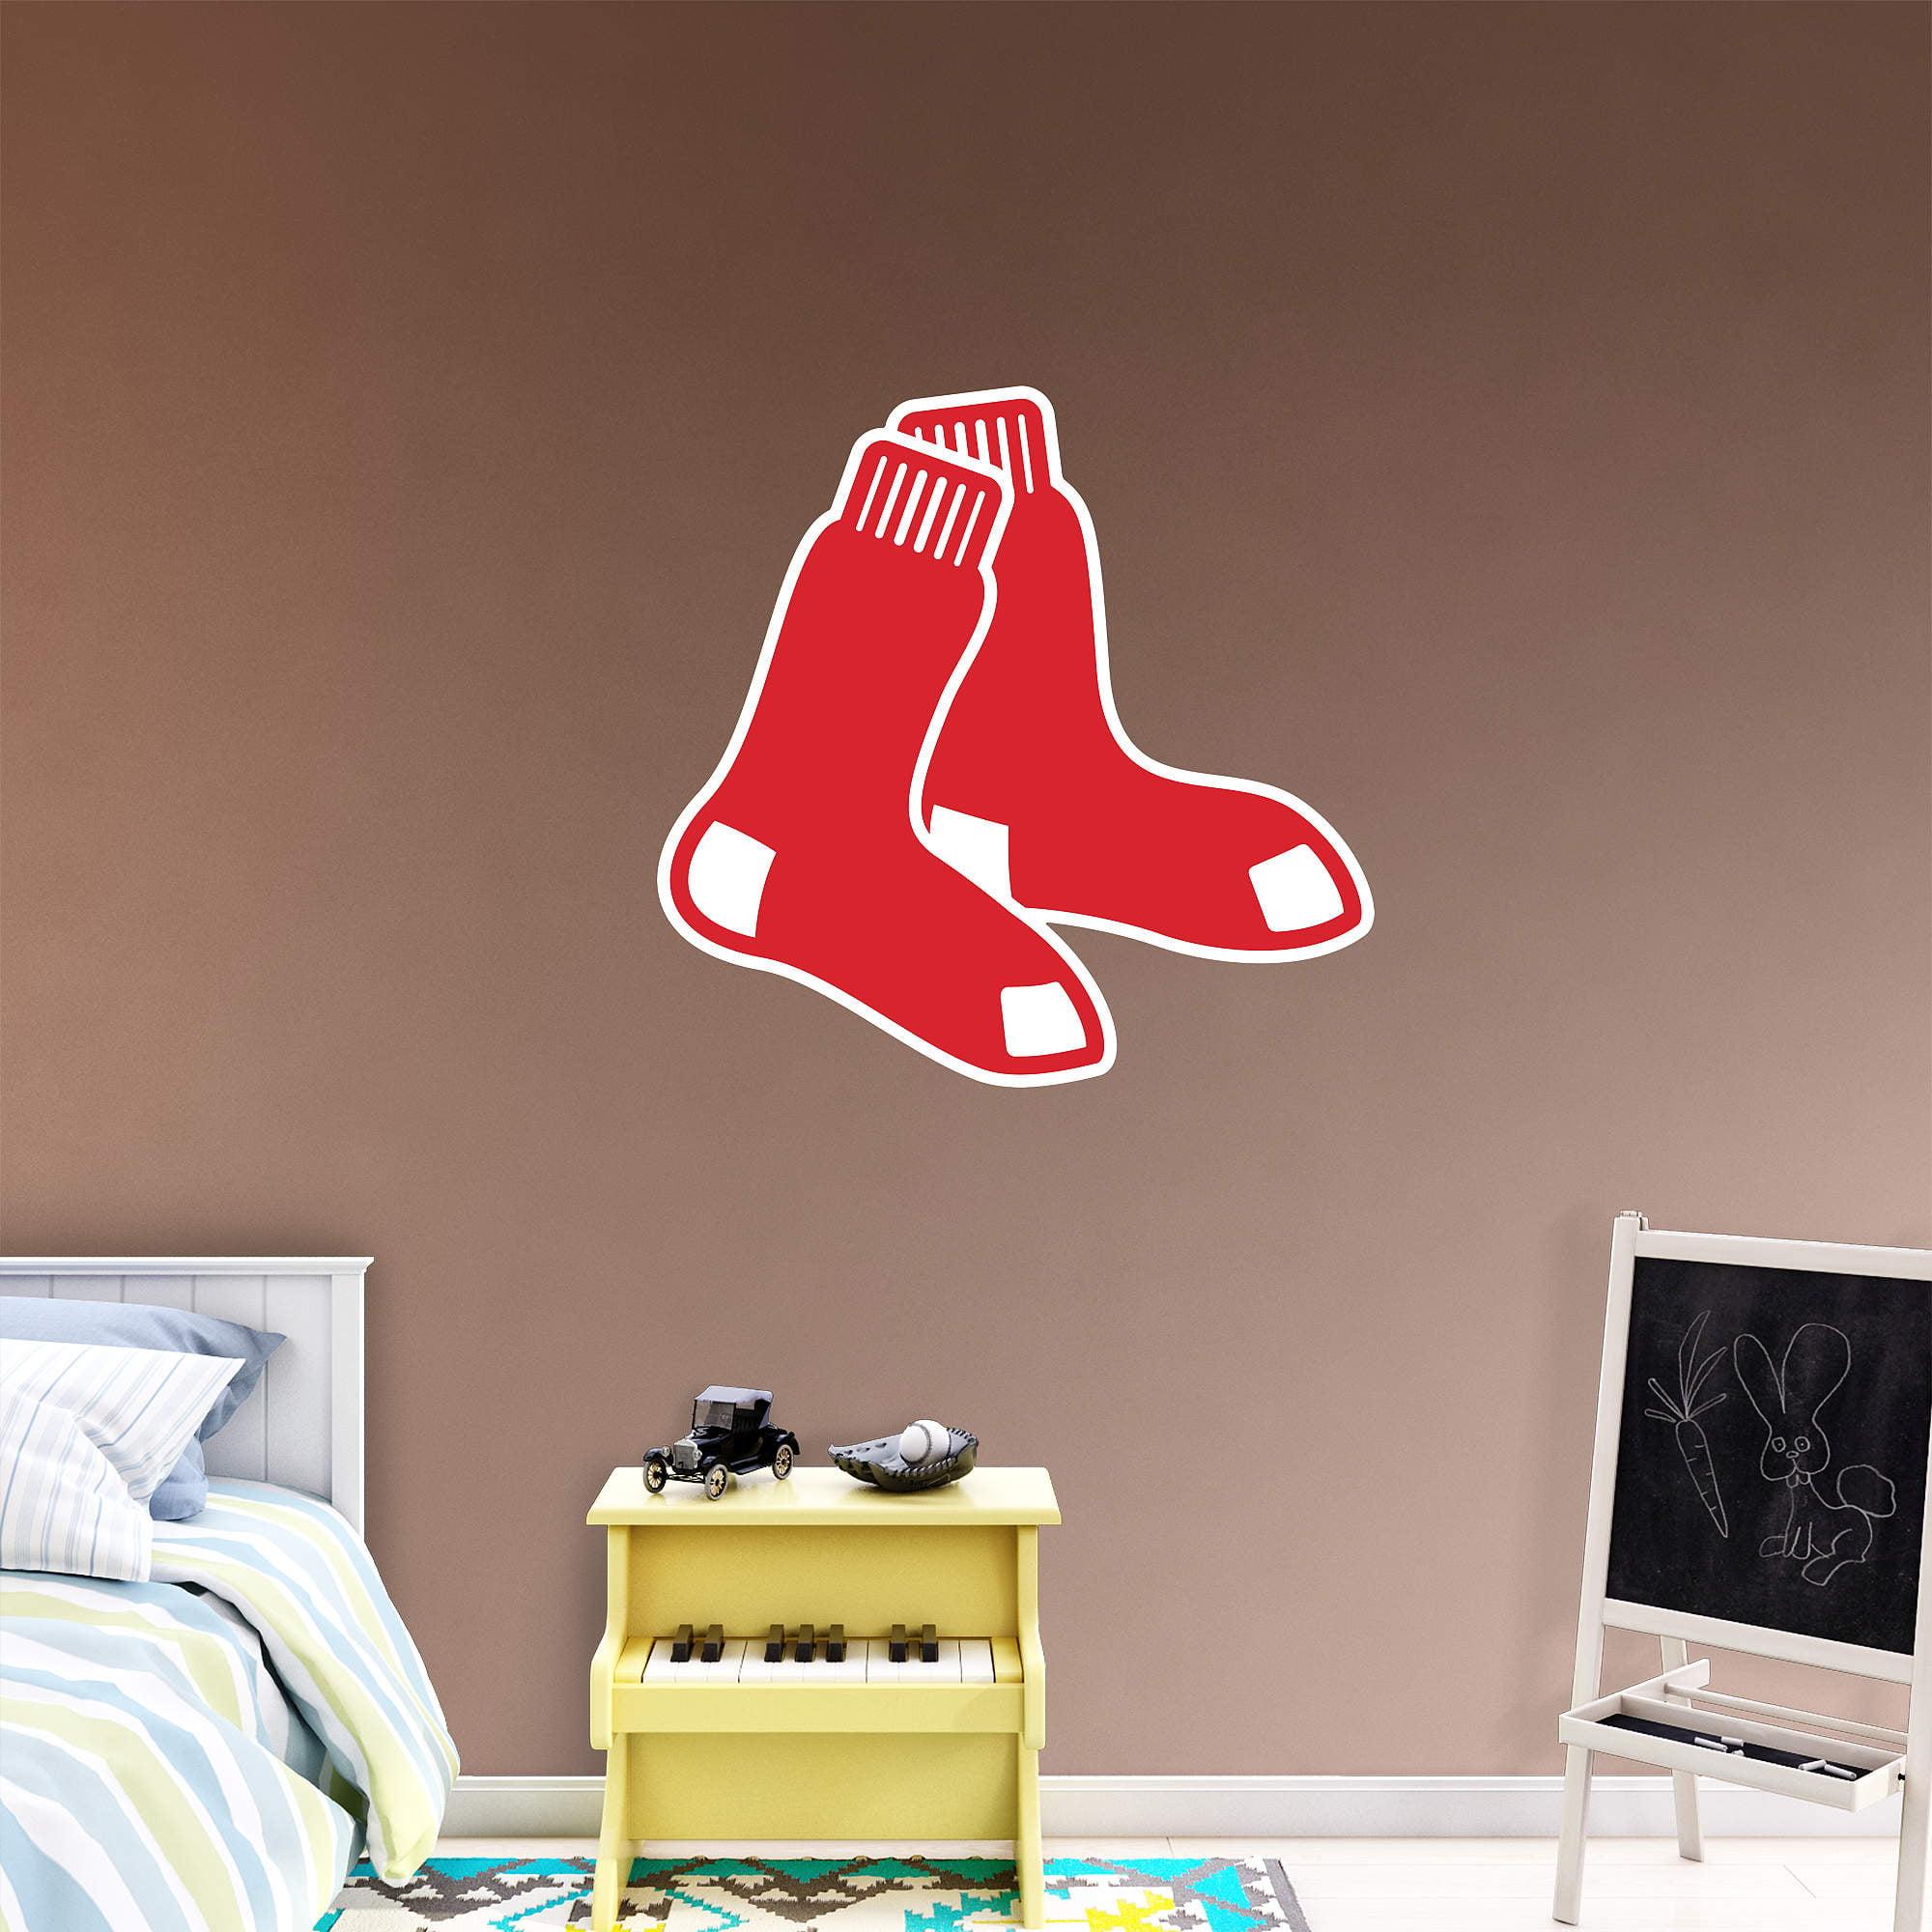 Boston Red Sox Fathead Team Logo Wall Decal - No Size